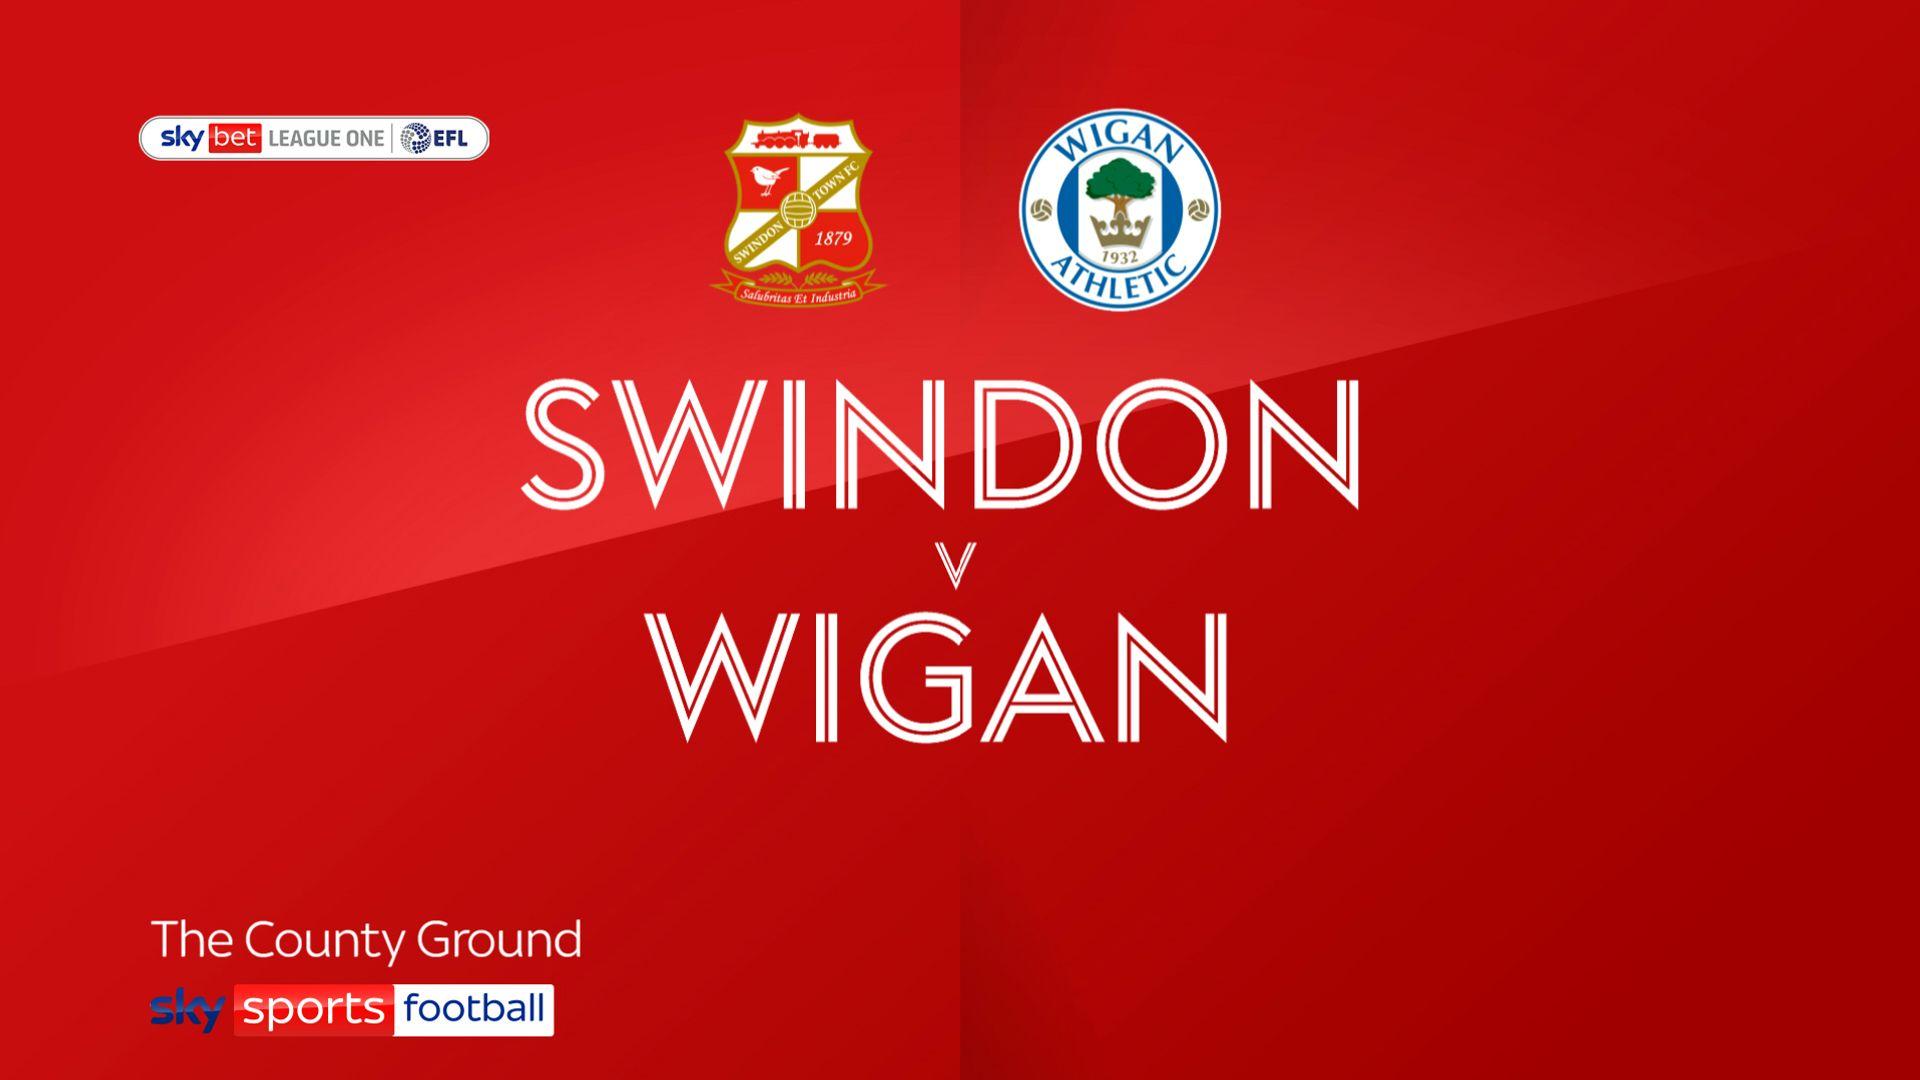 10-man Swindon edge past Wigan